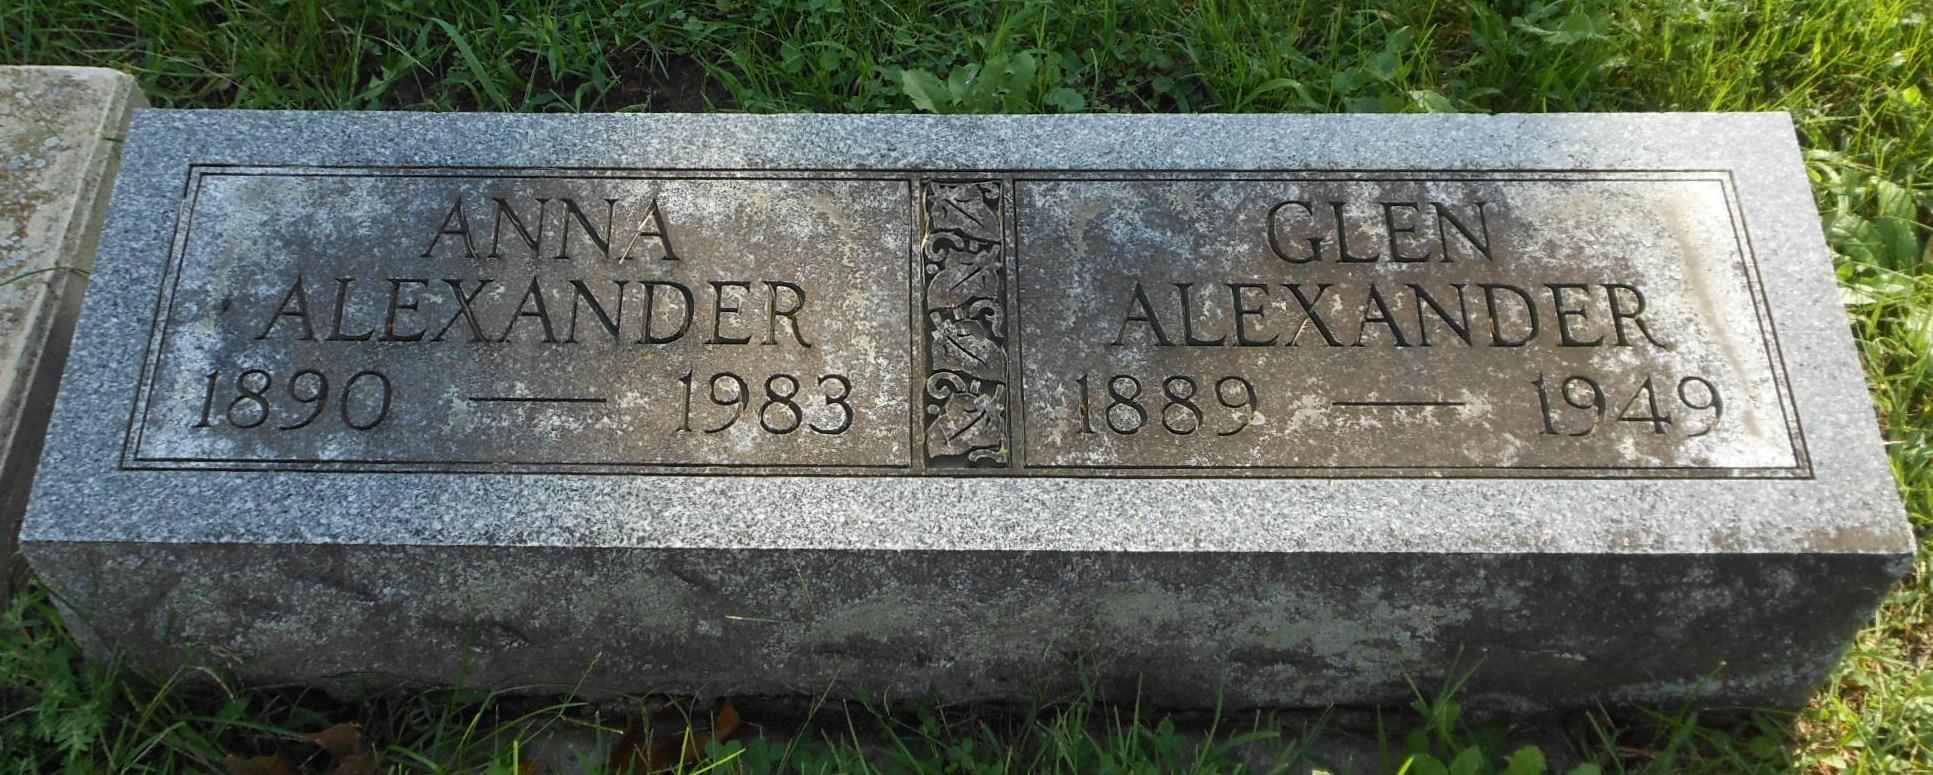 Glen Alexander